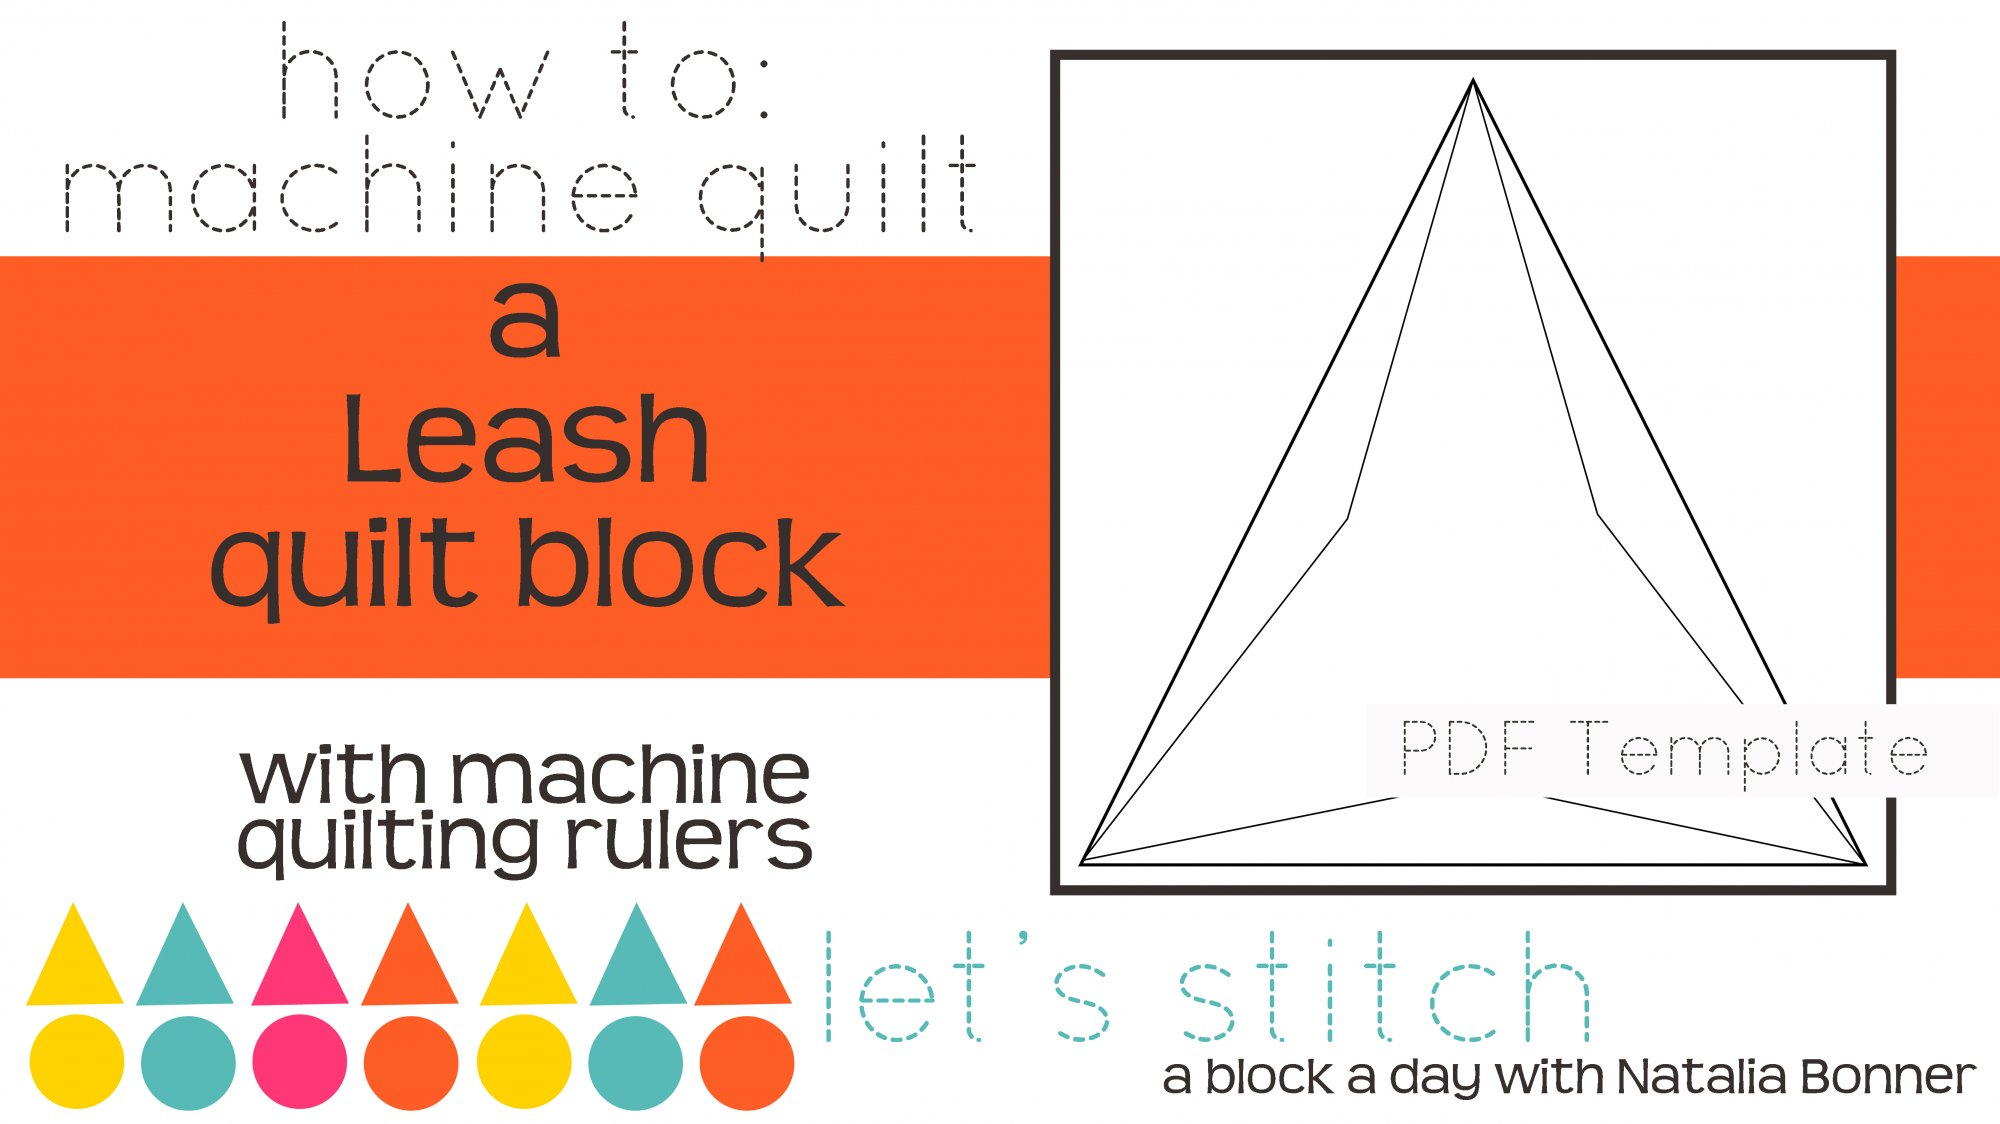 Let's Stitch - A Block a Day With Natalia Bonner - PDF - Leash